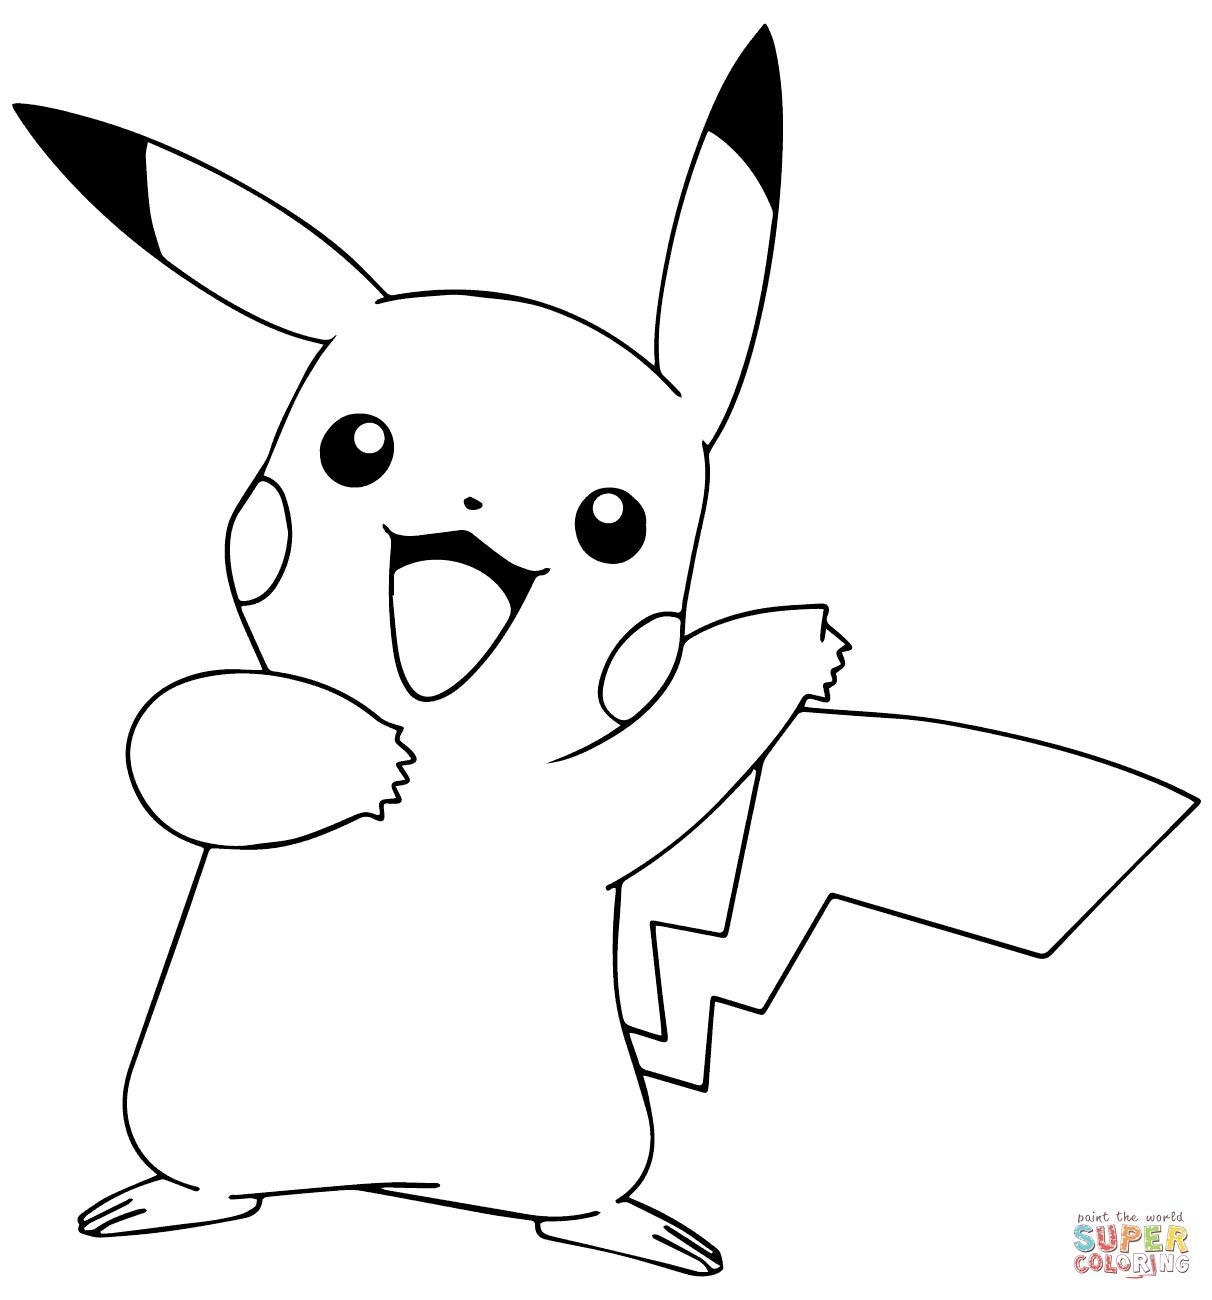 Pikachu from Pokémon GO - Pikachu PNG Black And White